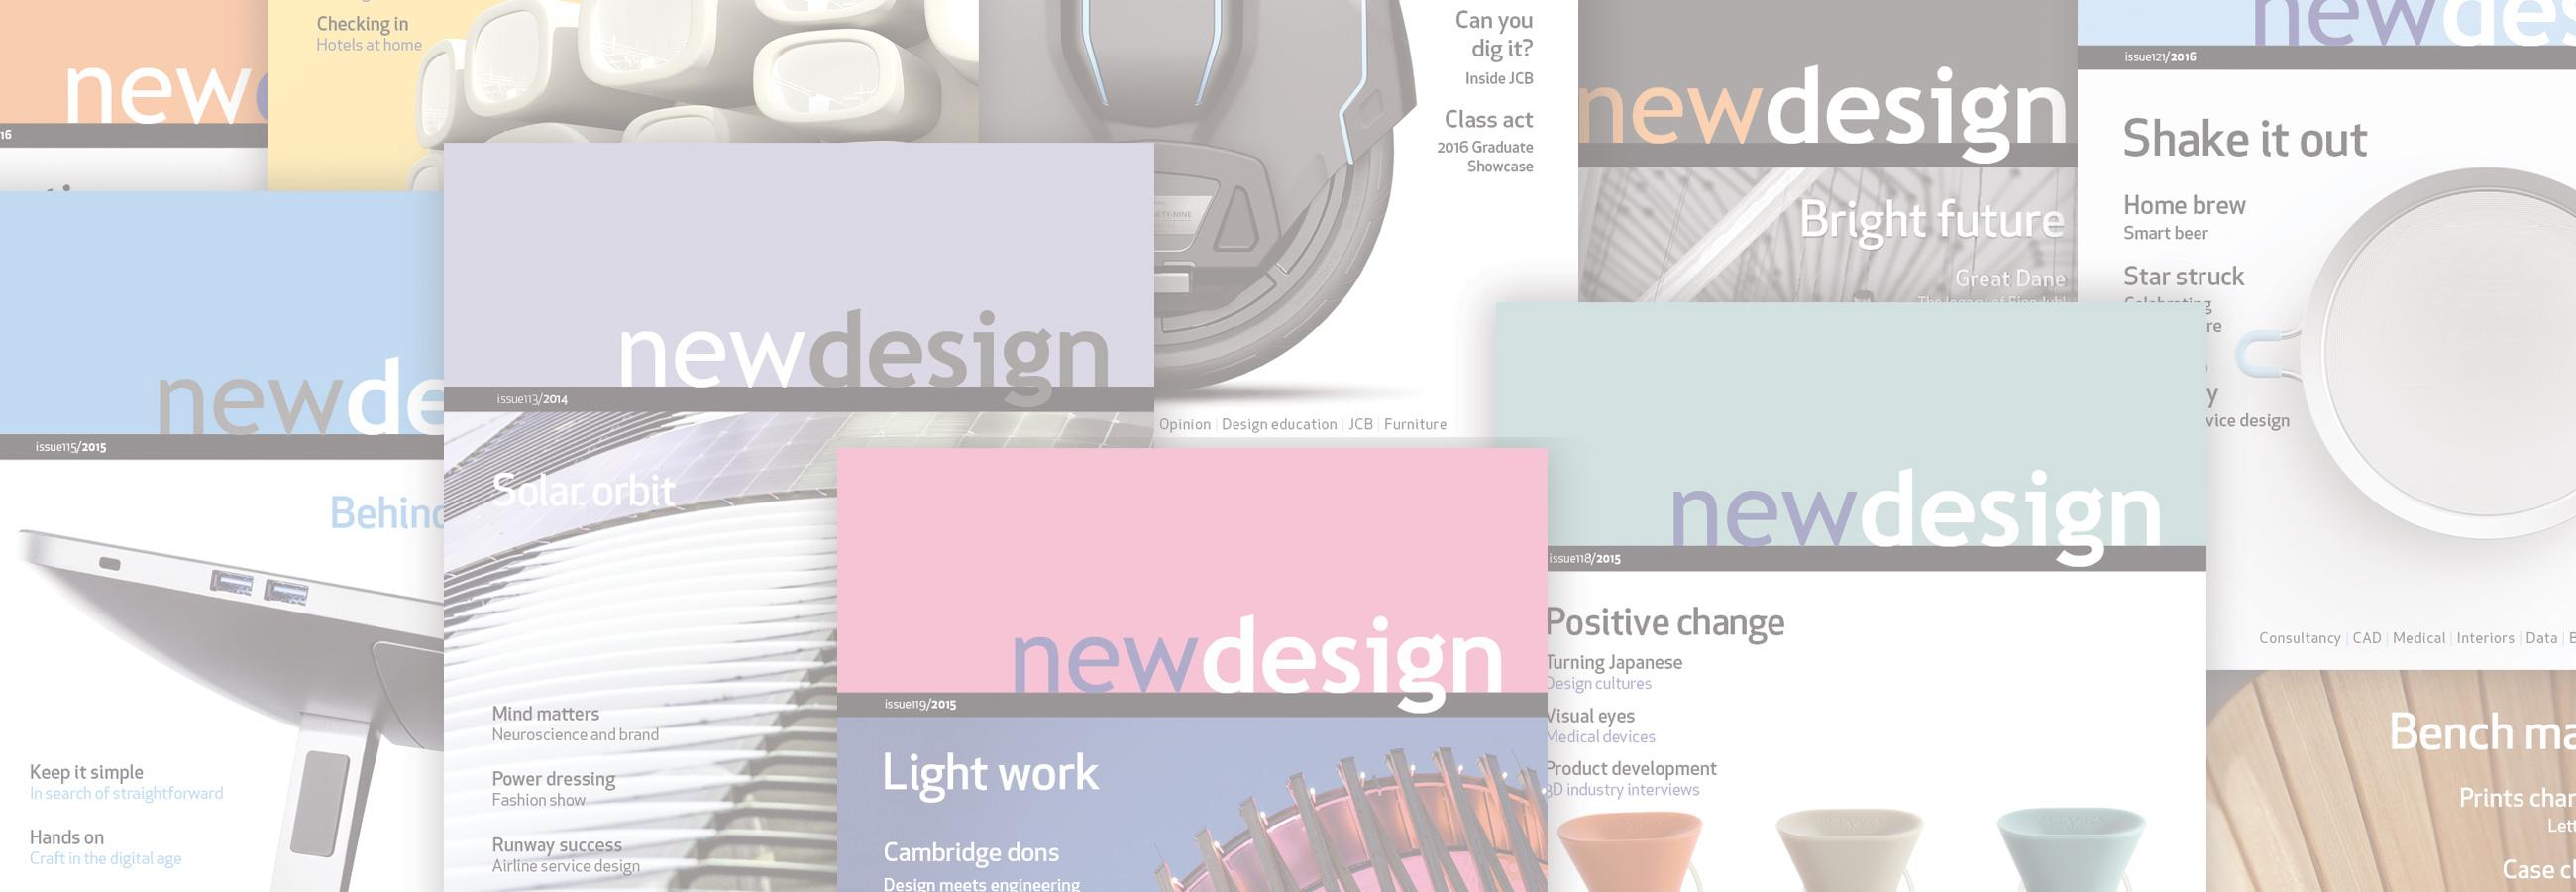 the design magazine for insight innovation inspiration get your copy now - Design For Magazine